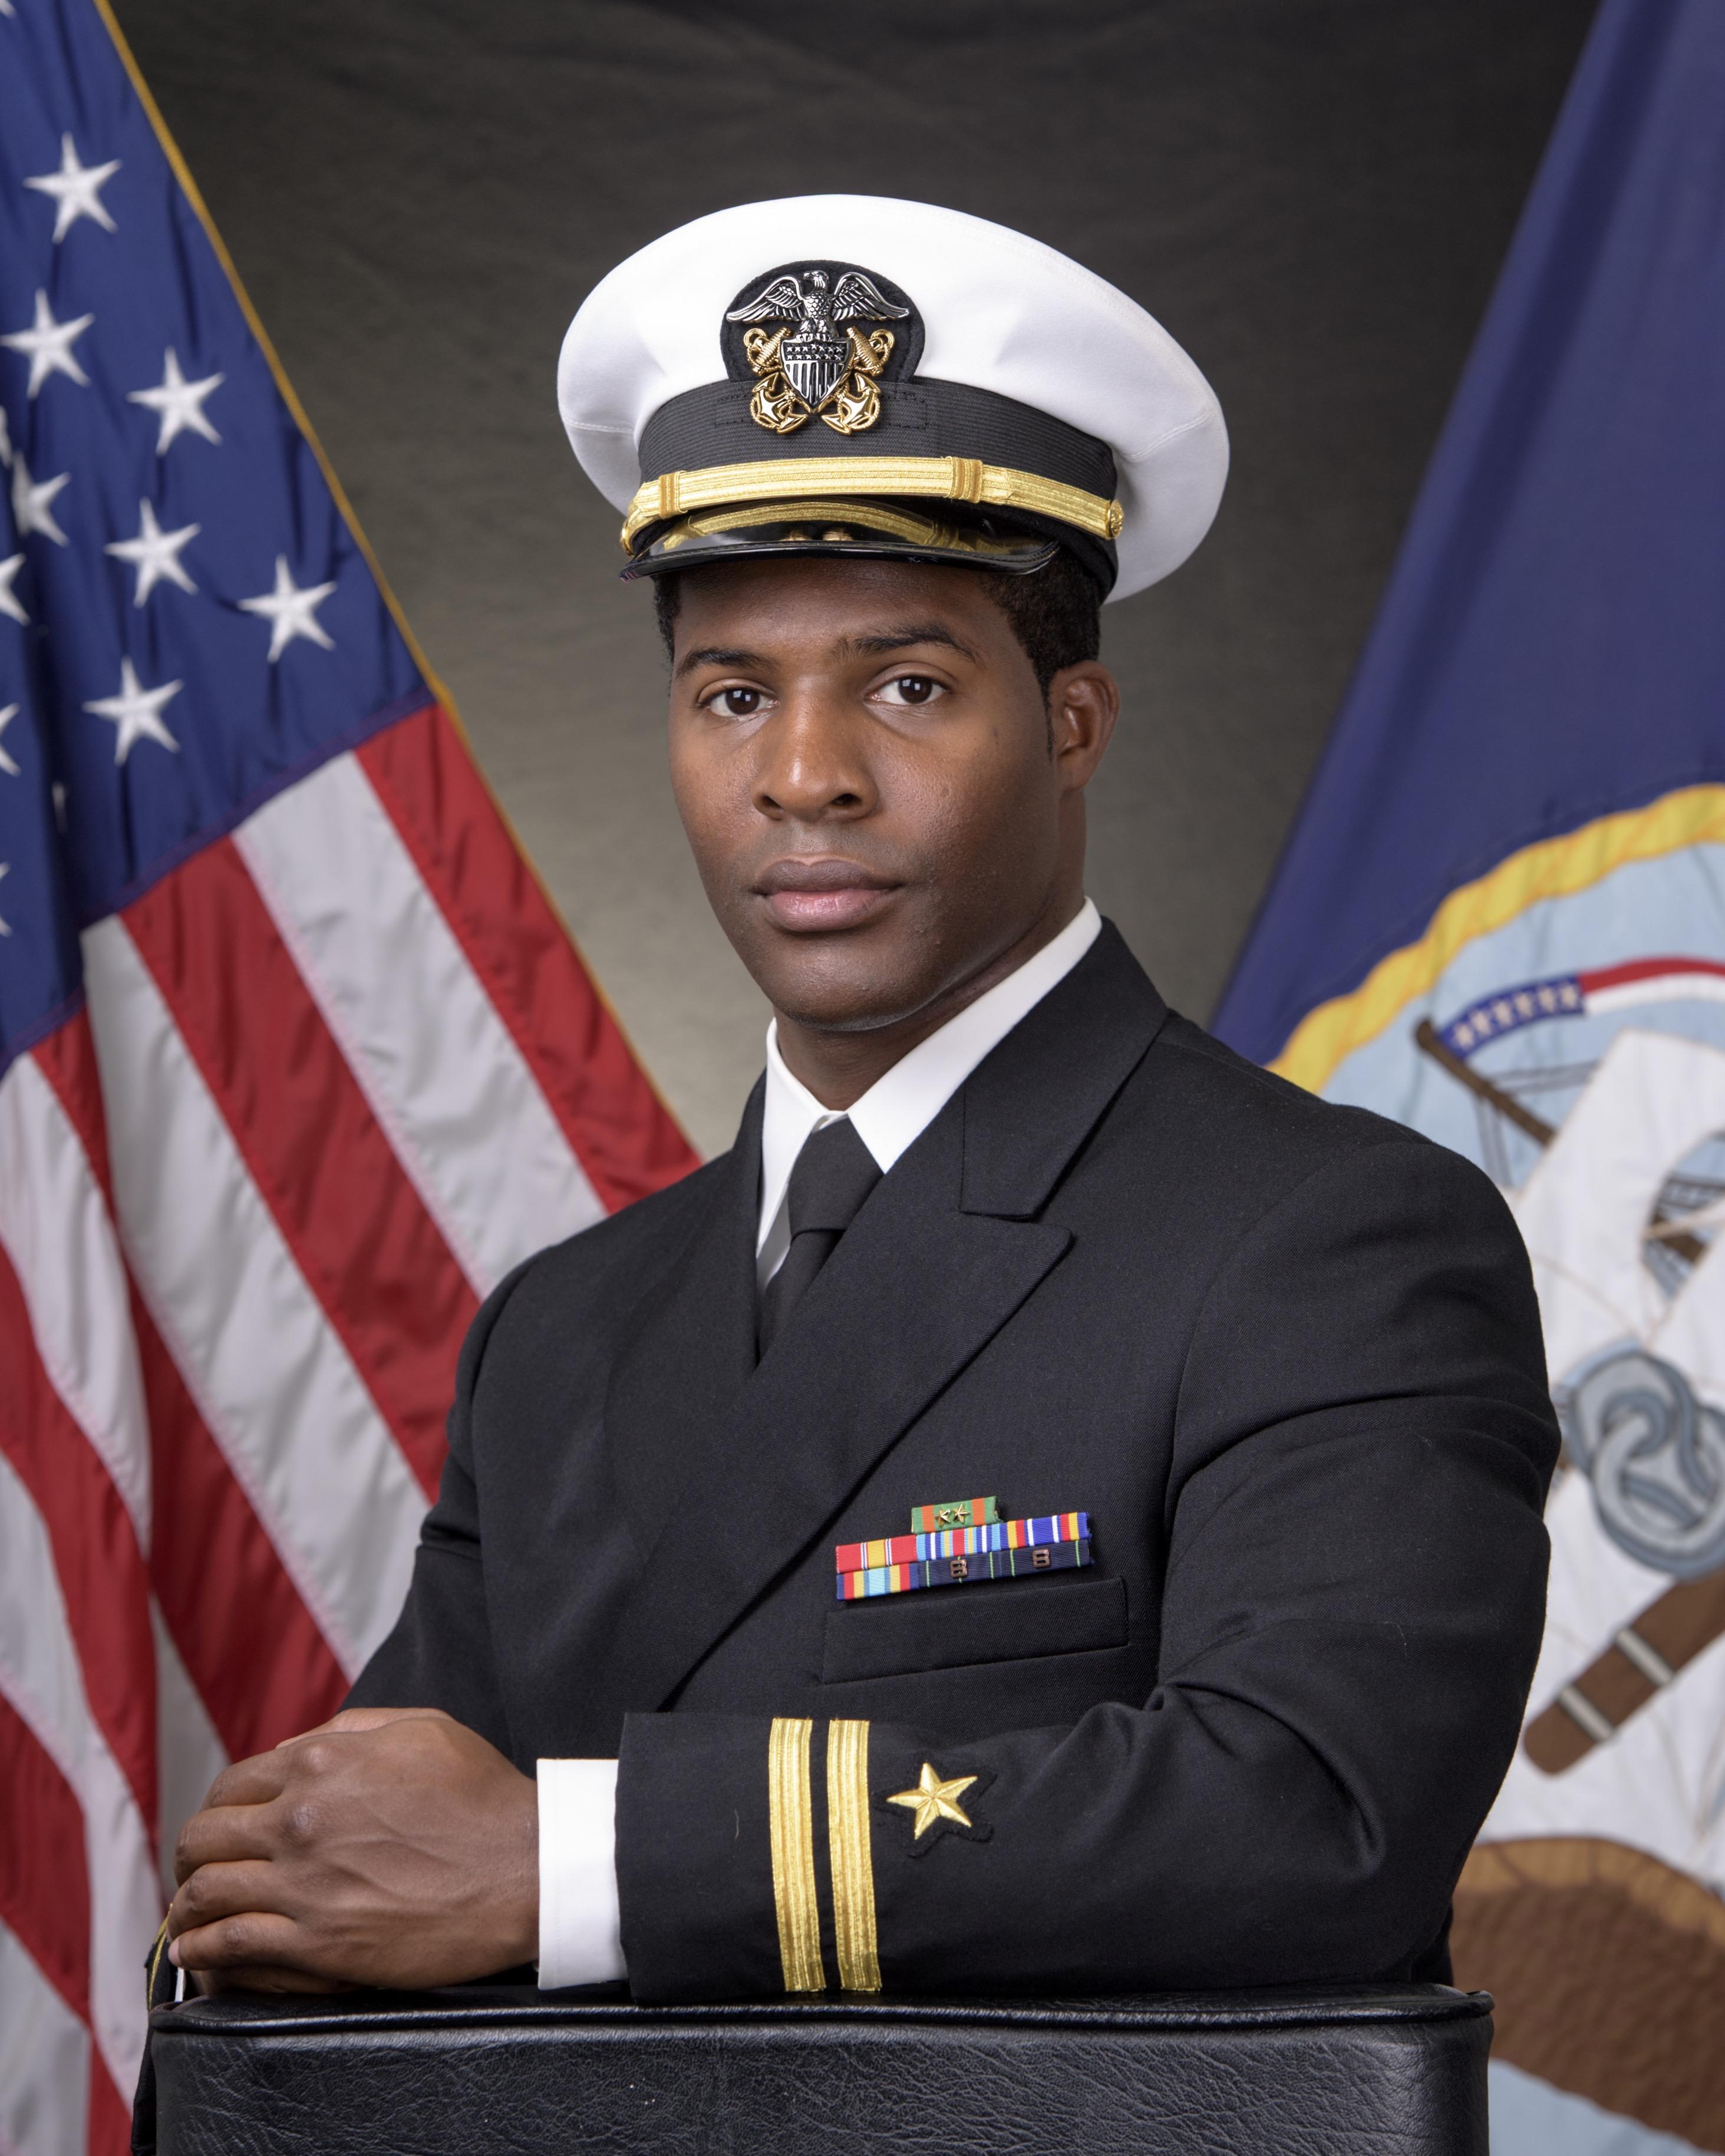 I'm Black, I'm American, I'm a Veteran, & I Stand For the Flag, Here's Why…